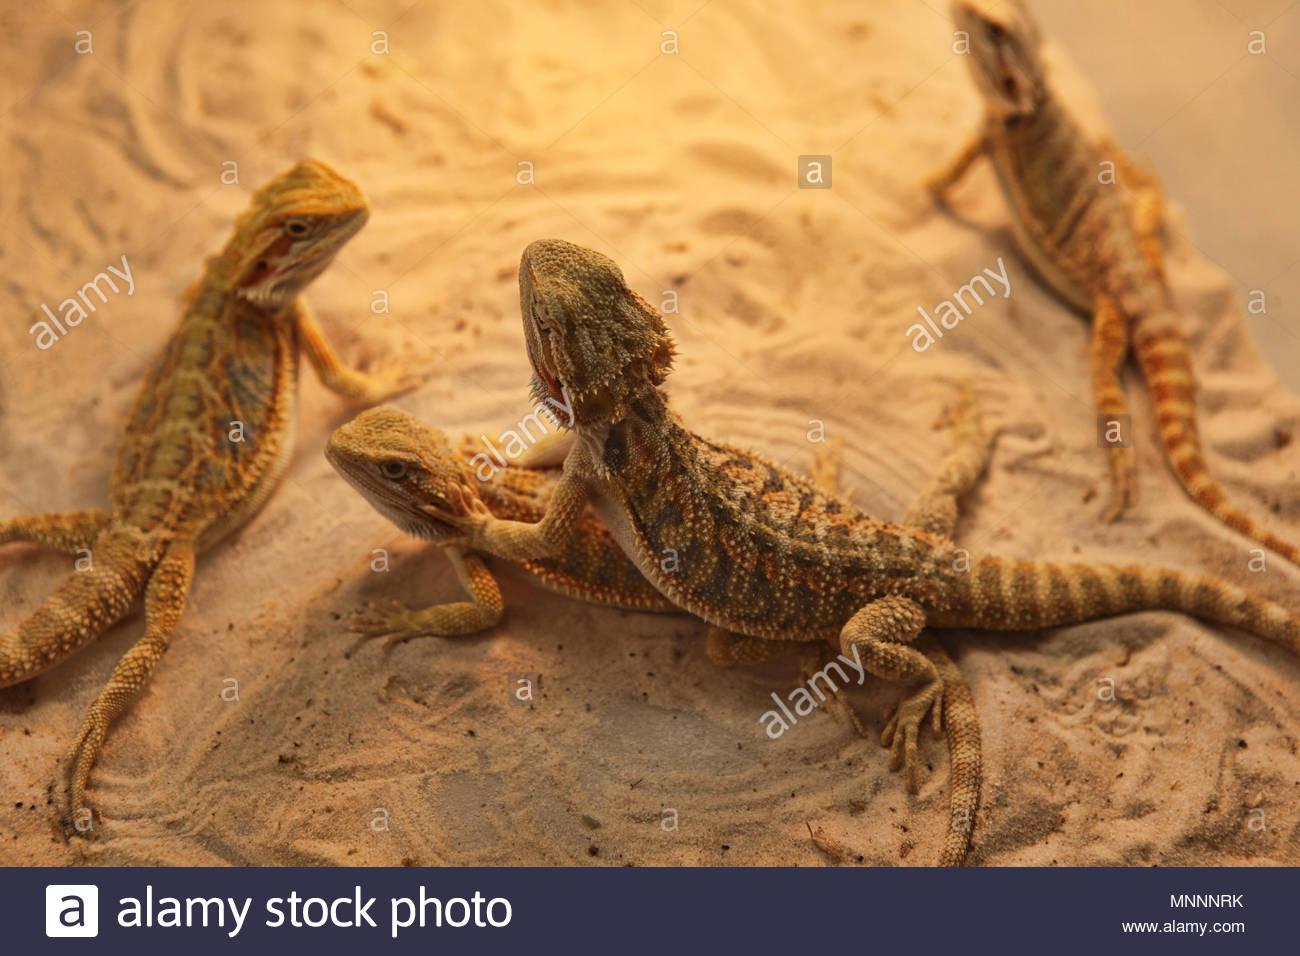 Exotic hypo-tangerine bearded dragons (Pogona) displayed at